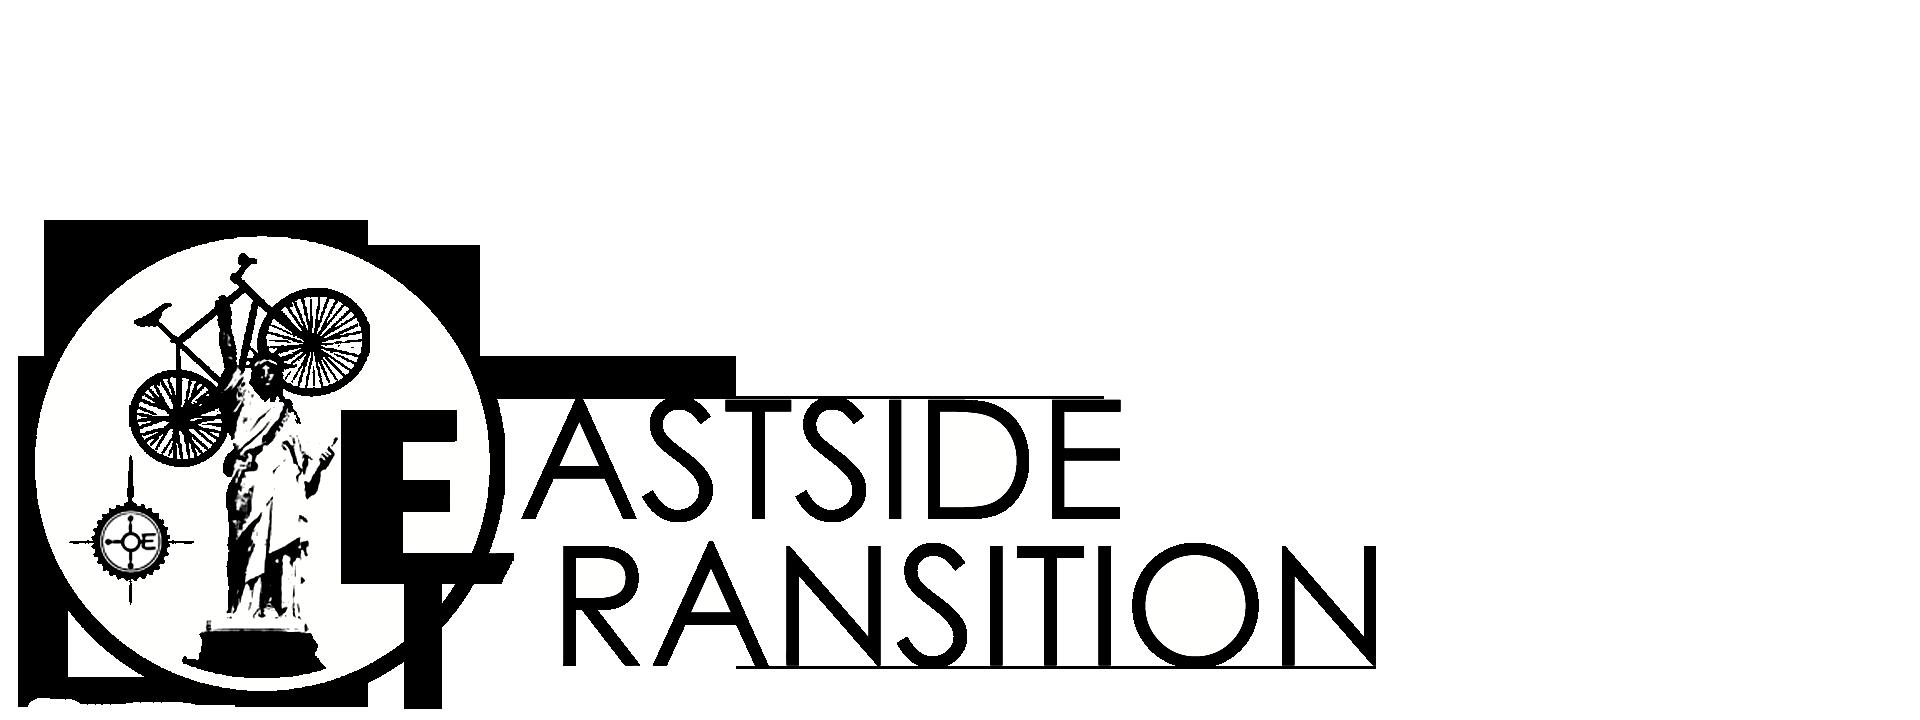 EASTSIDE TRANSITION